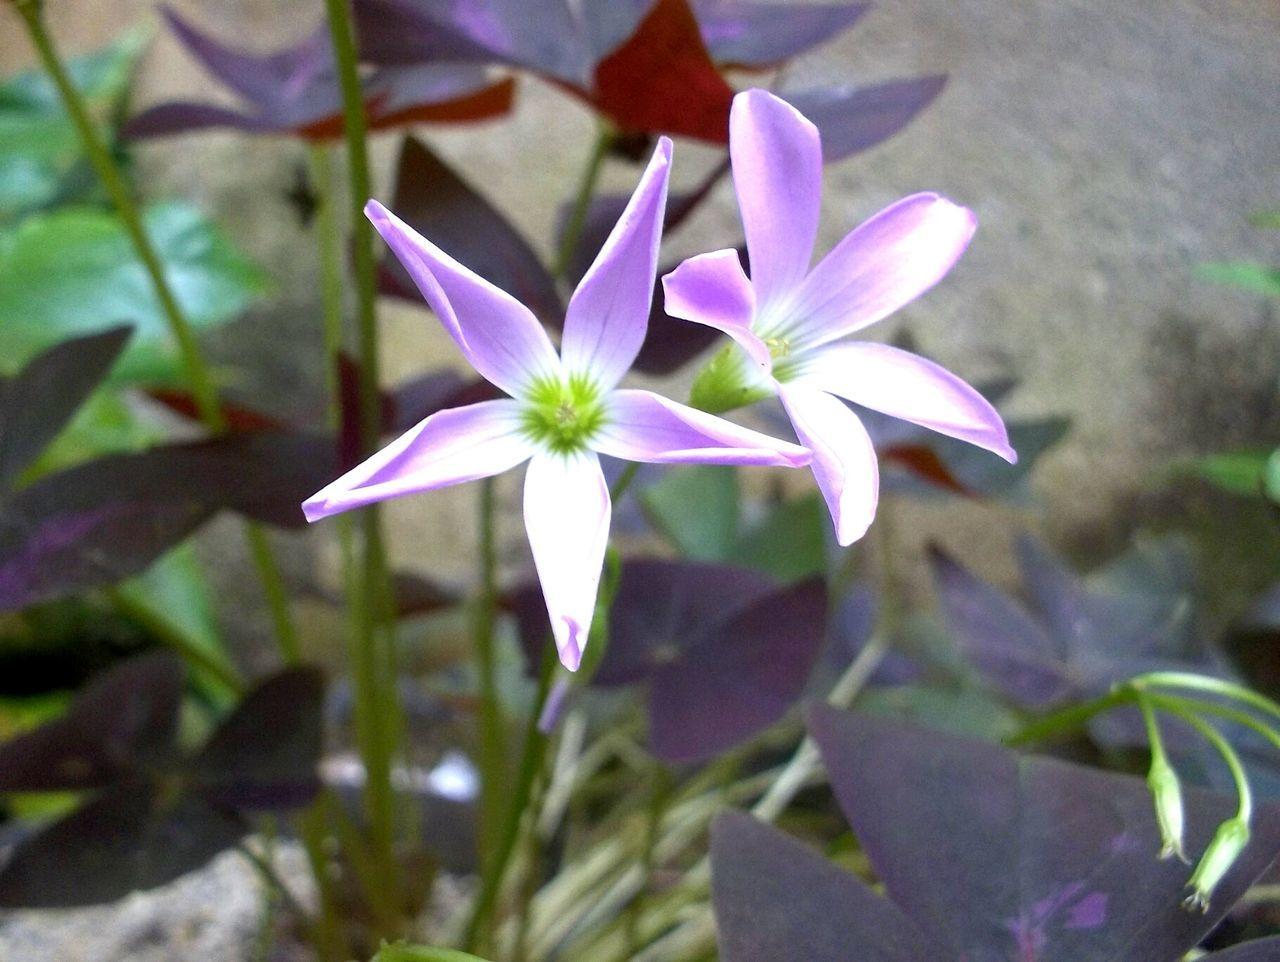 Flow likes flowers